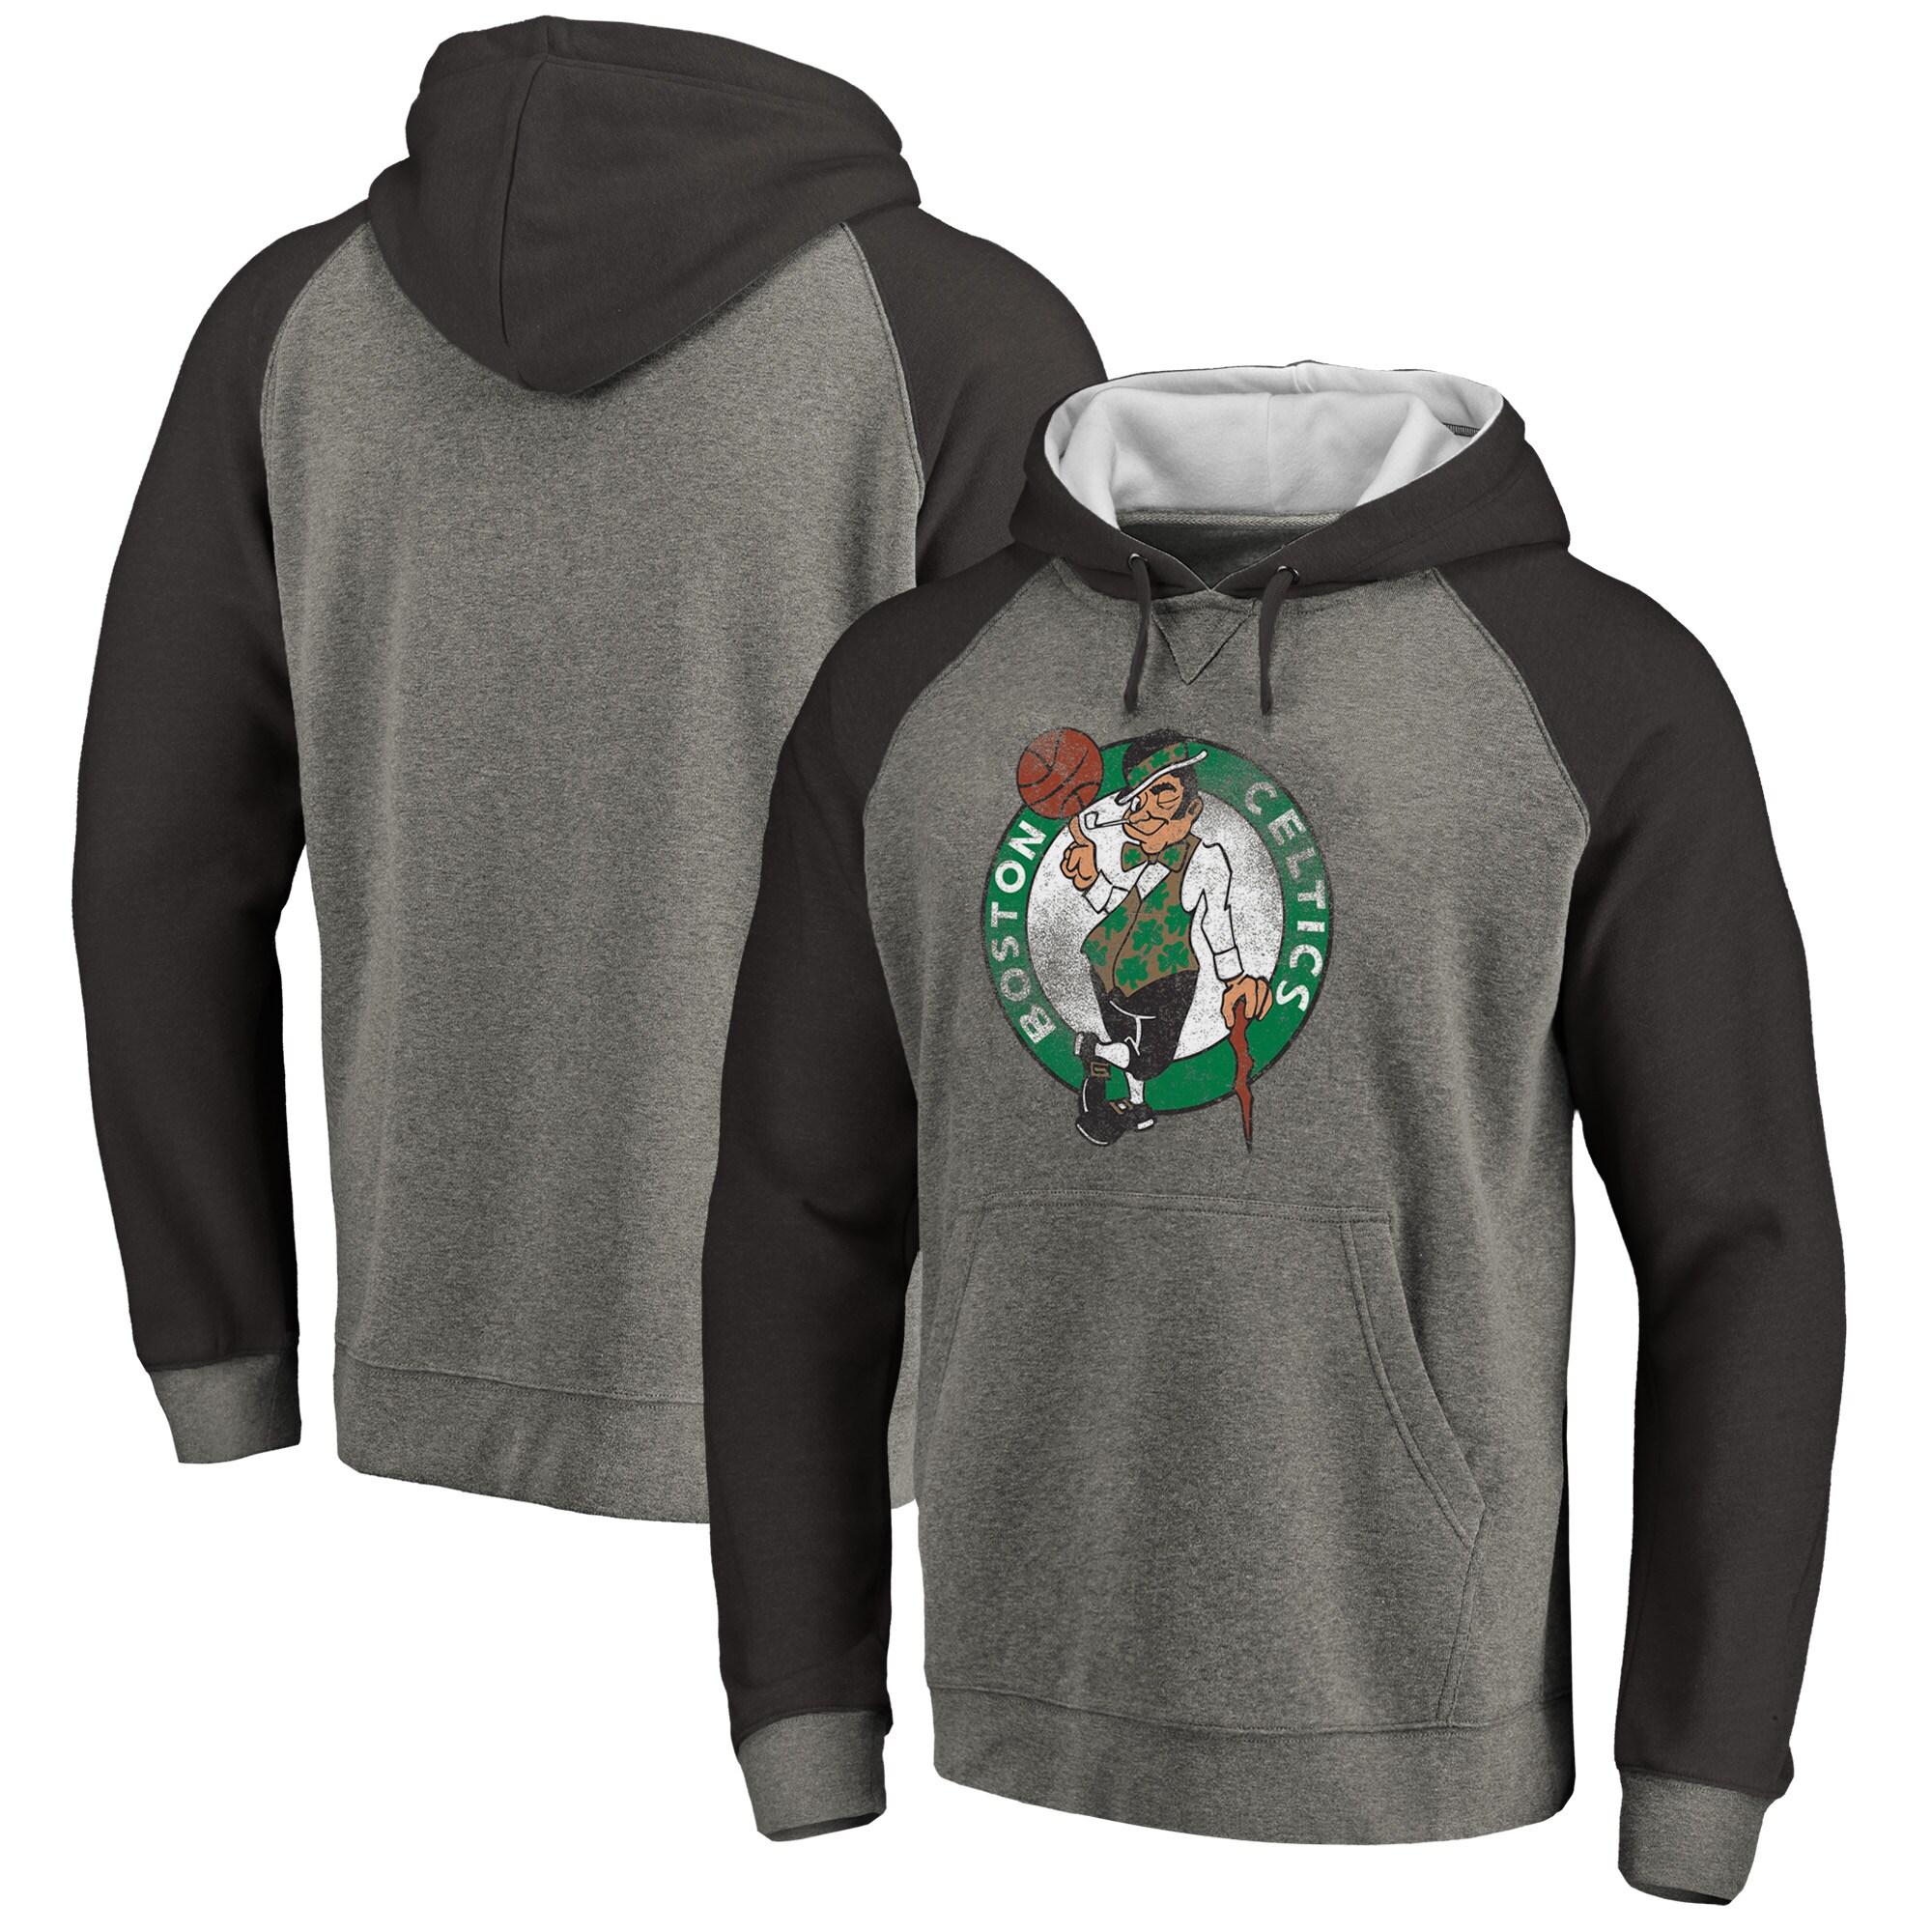 Boston Celtics Fanatics Branded Distressed Logo Tri-Blend Pullover Hoodie - Ash/Black